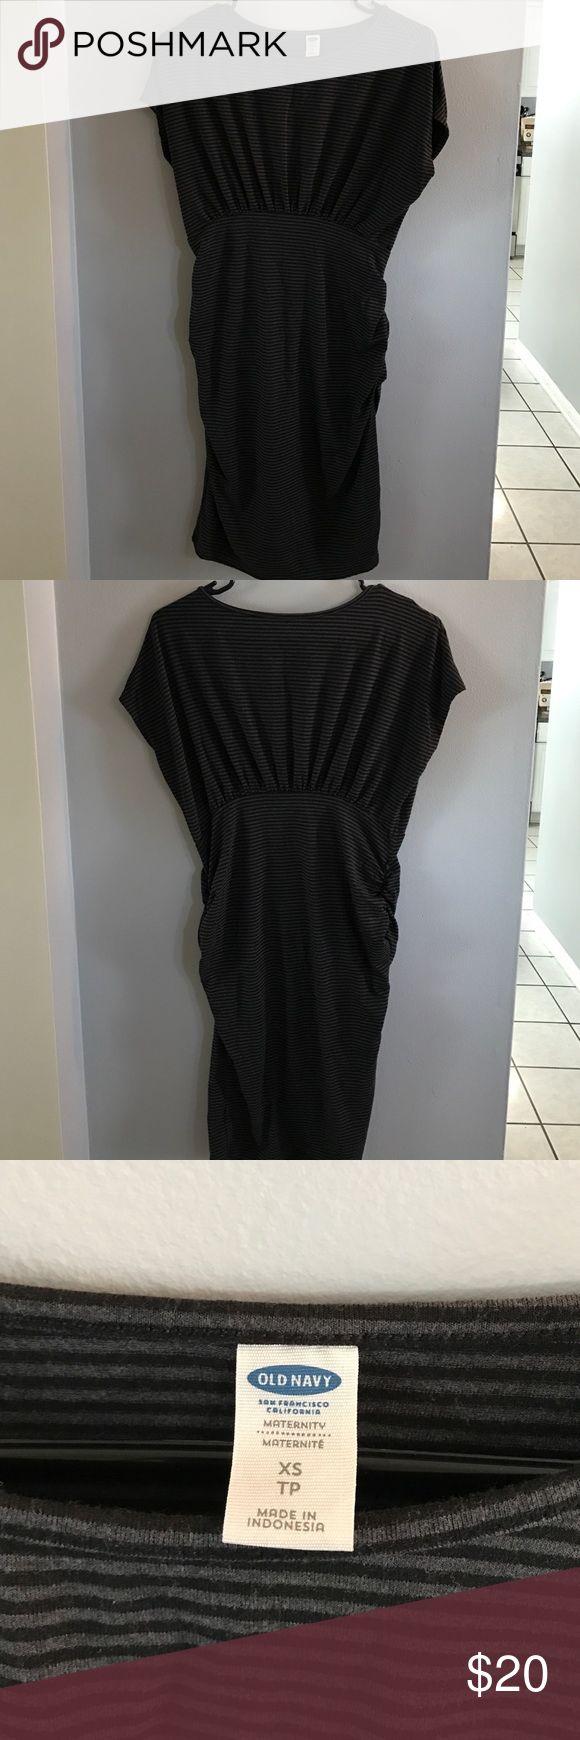 Old navy maternity dress XS old navy maternity dress - never worn - smoke free, dog friendly home Old Navy Dresses Midi